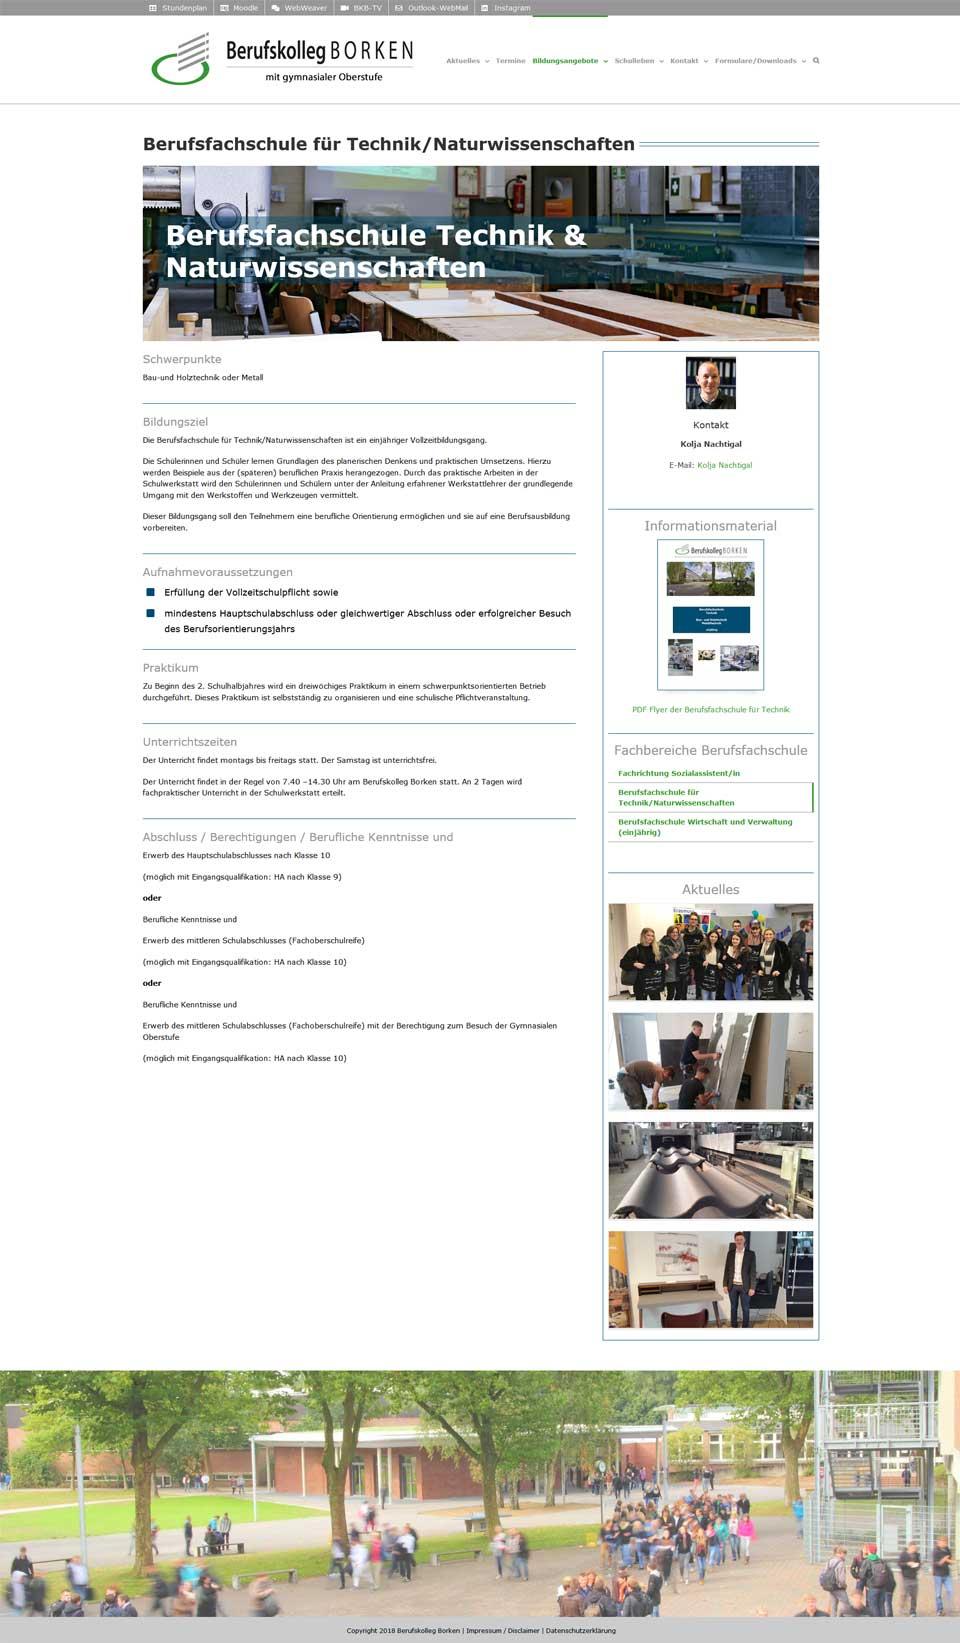 Berufskolleg-Borken-Berufsfachschule